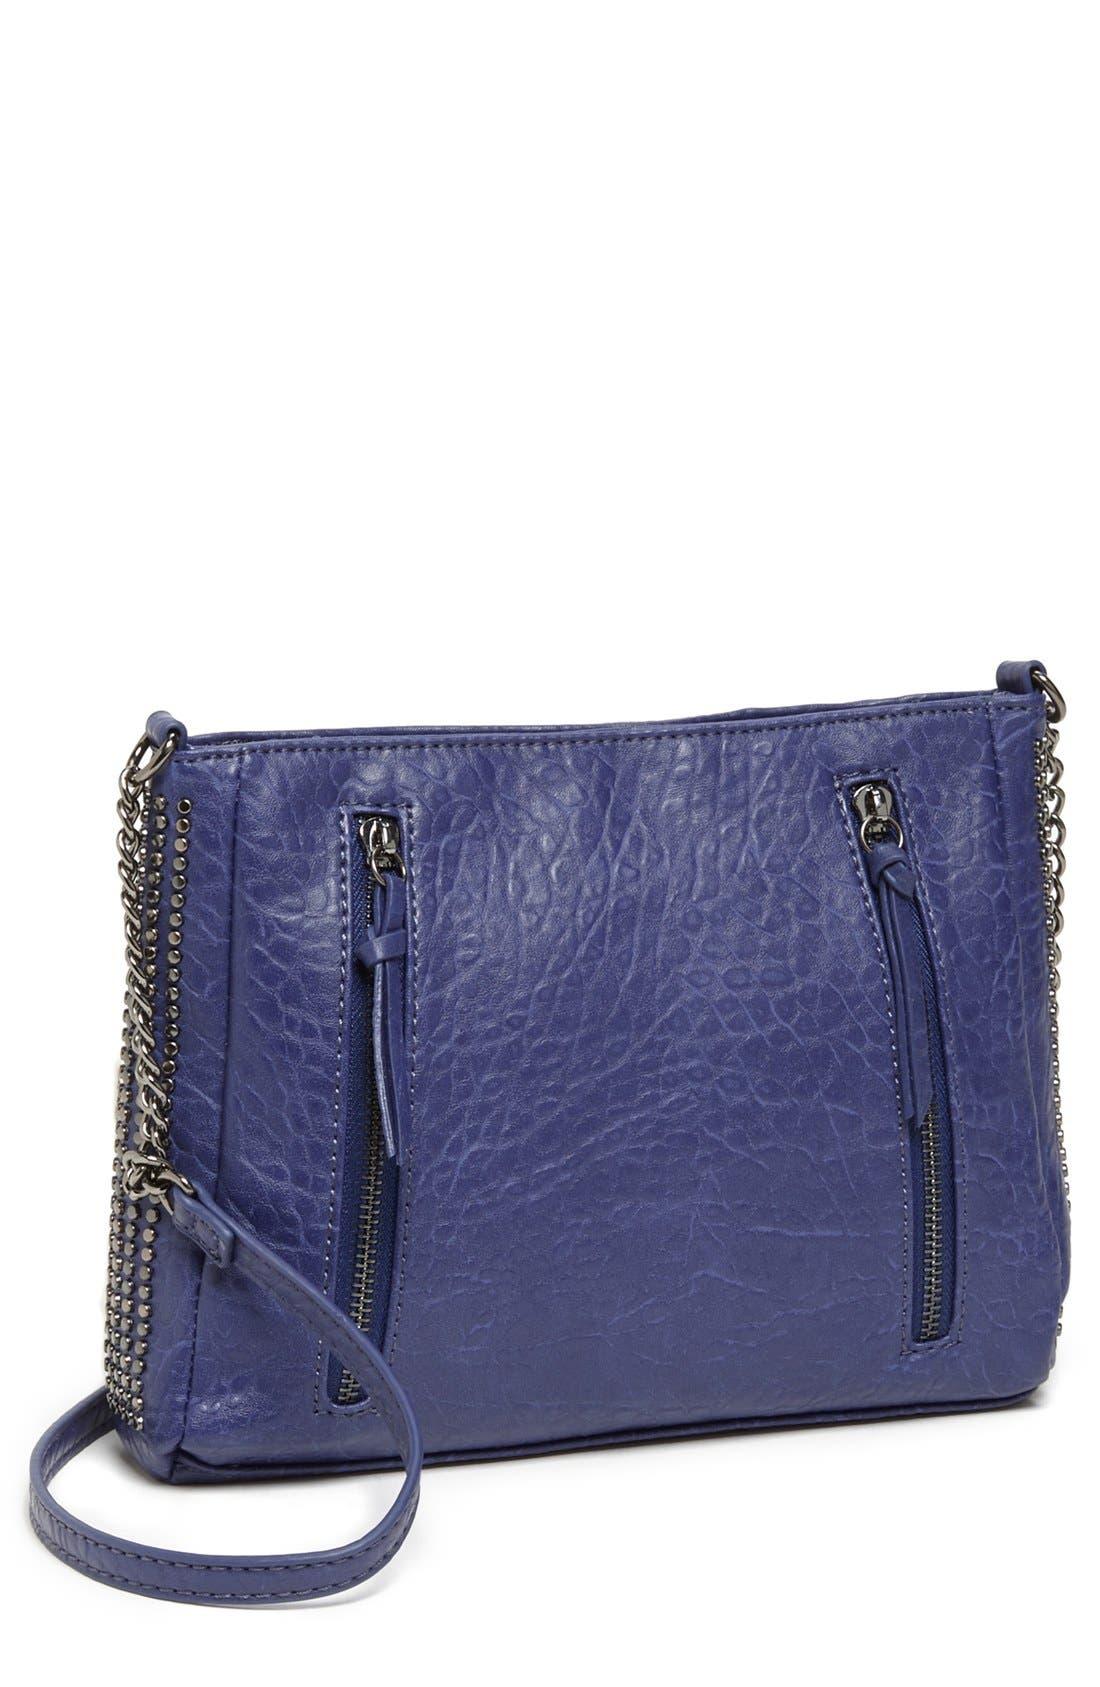 Alternate Image 1 Selected - BP. Double Zip Studded Crossbody Bag (Juniors)